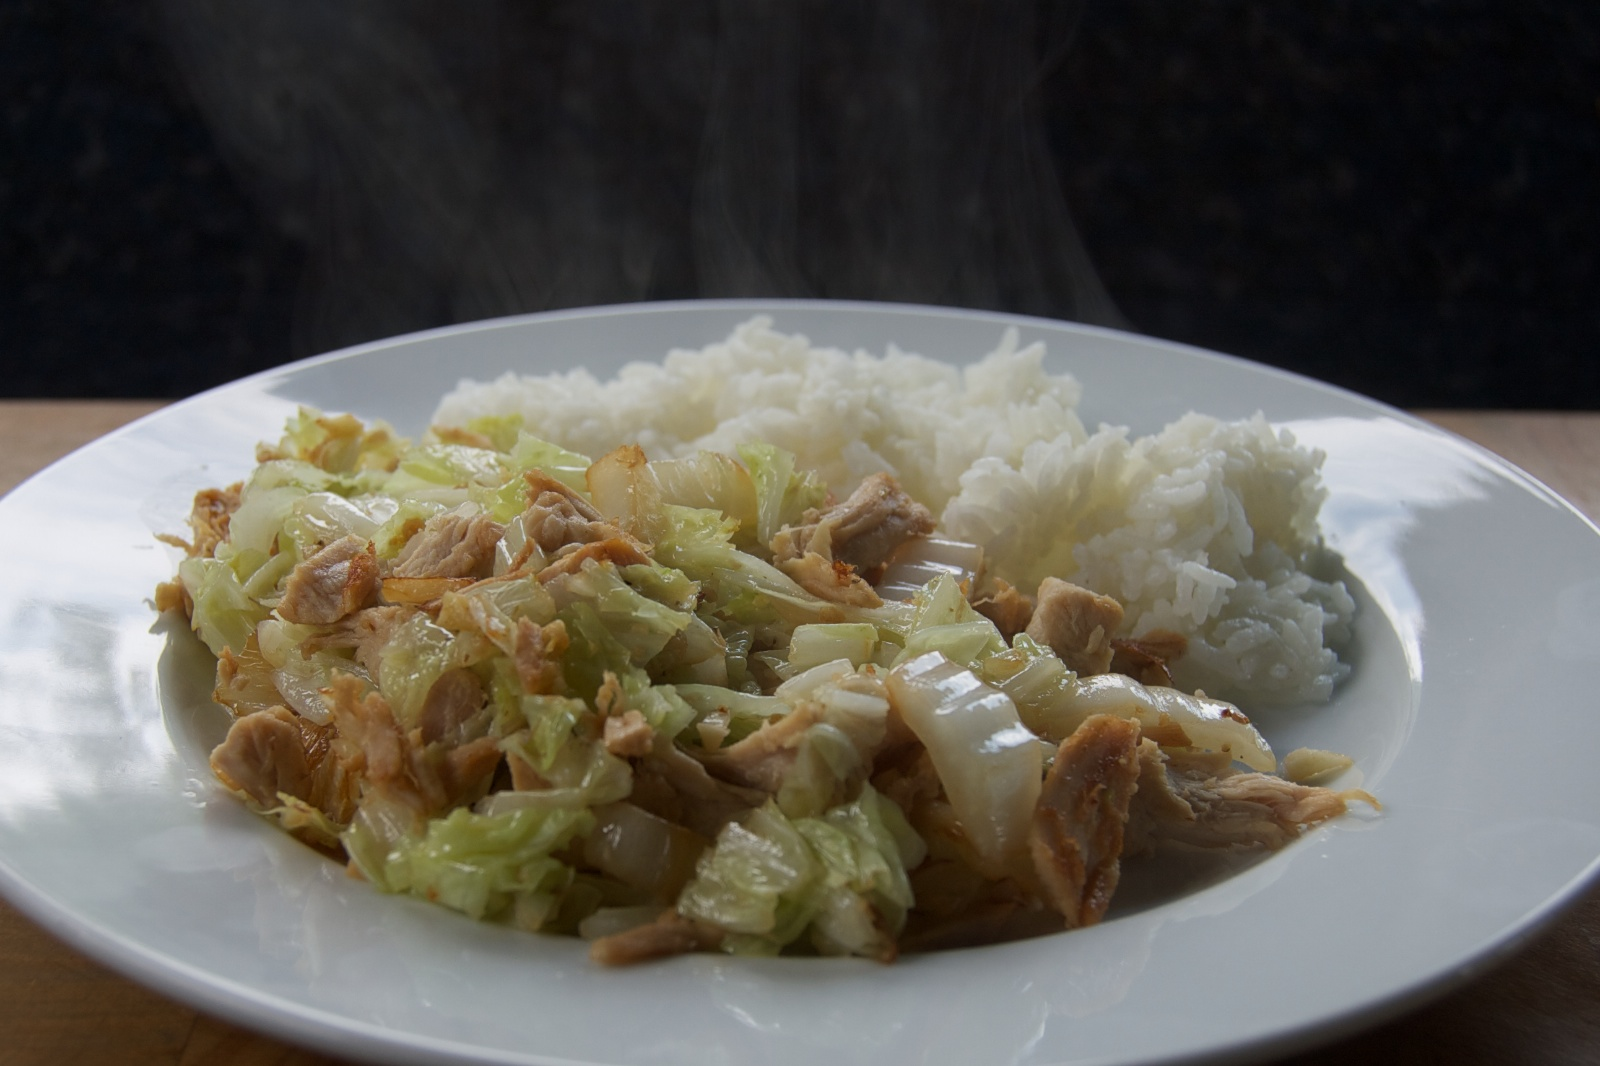 http://blog.rickk.com/food/2014/07/26/ate.2014.07.26.l.jpg